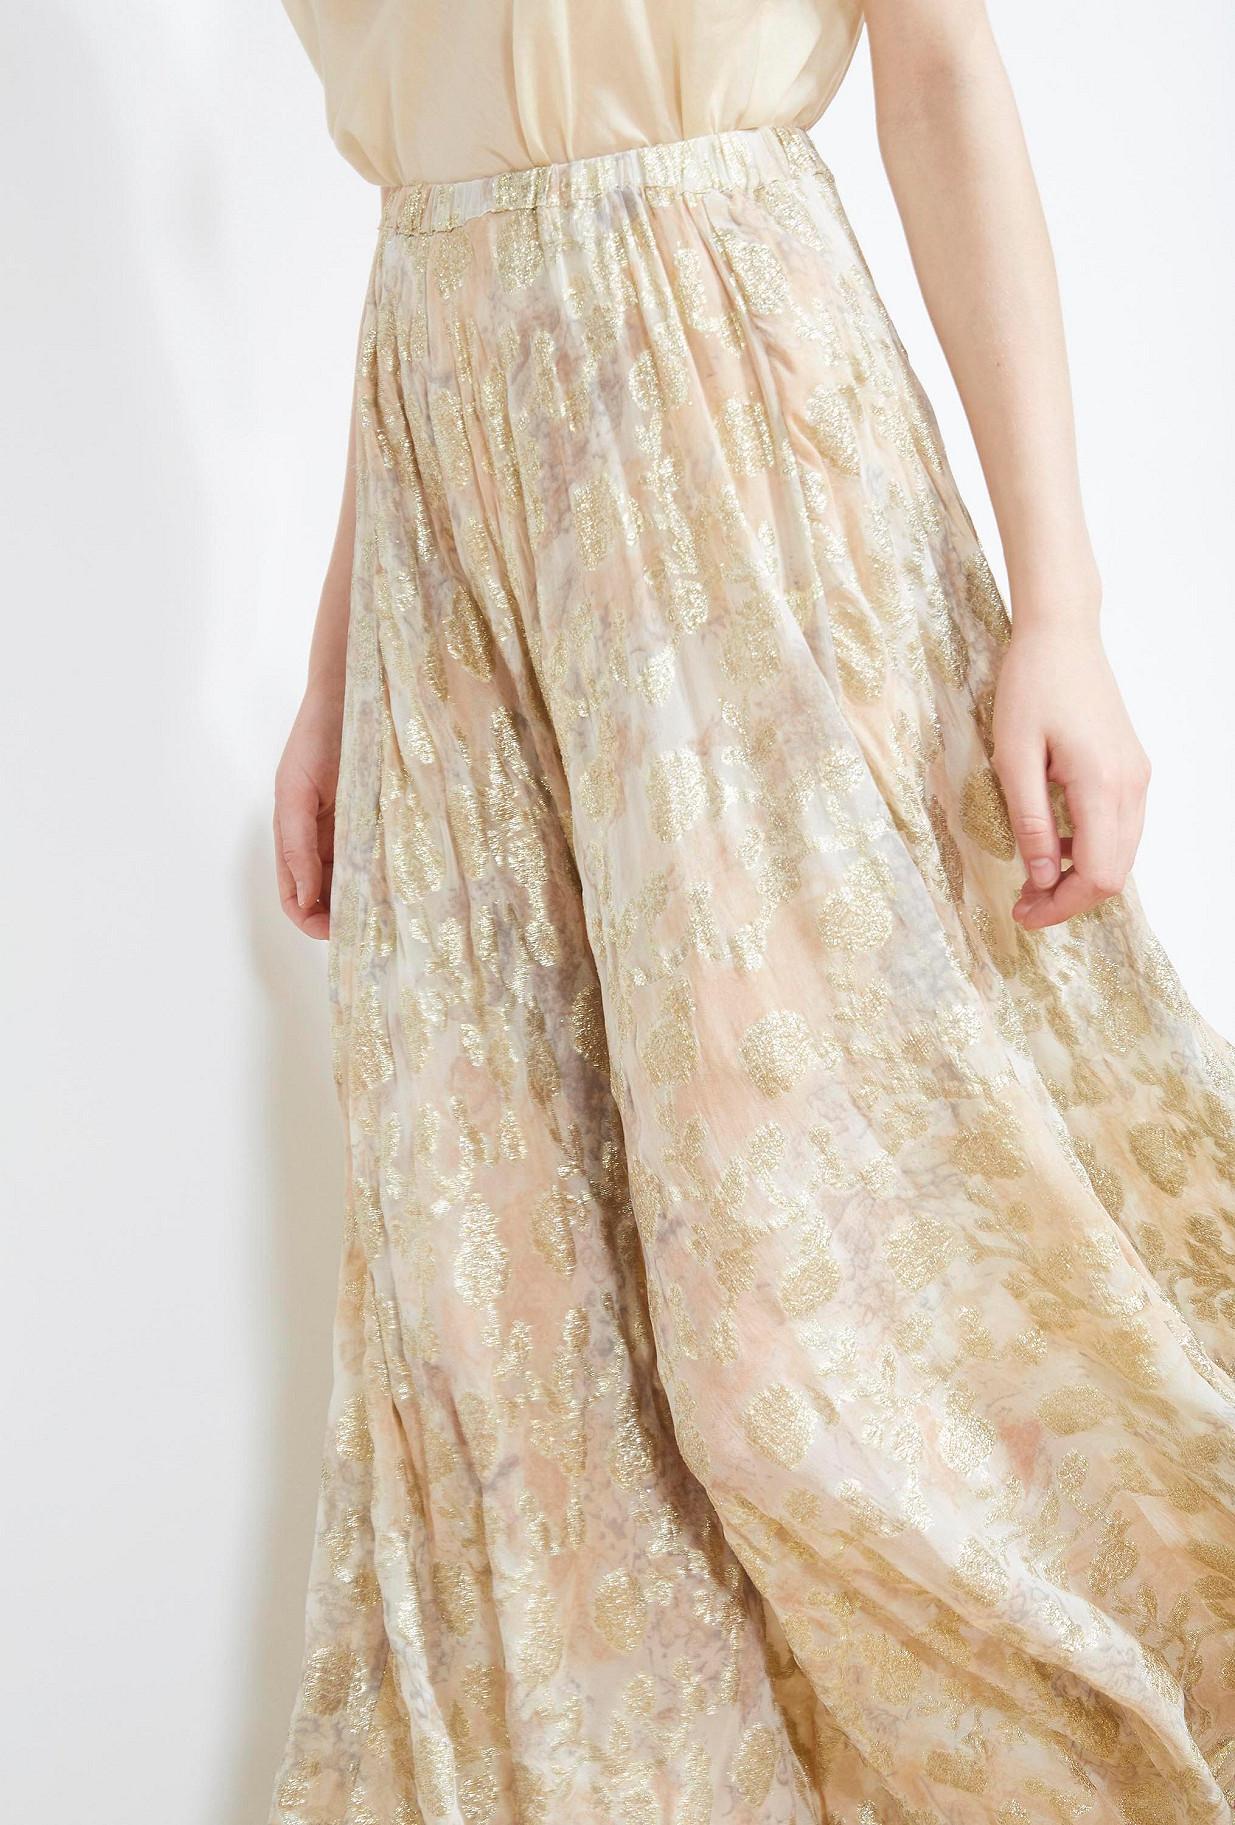 Powder  SKIRT  Agrippine Mes demoiselles fashion clothes designer Paris